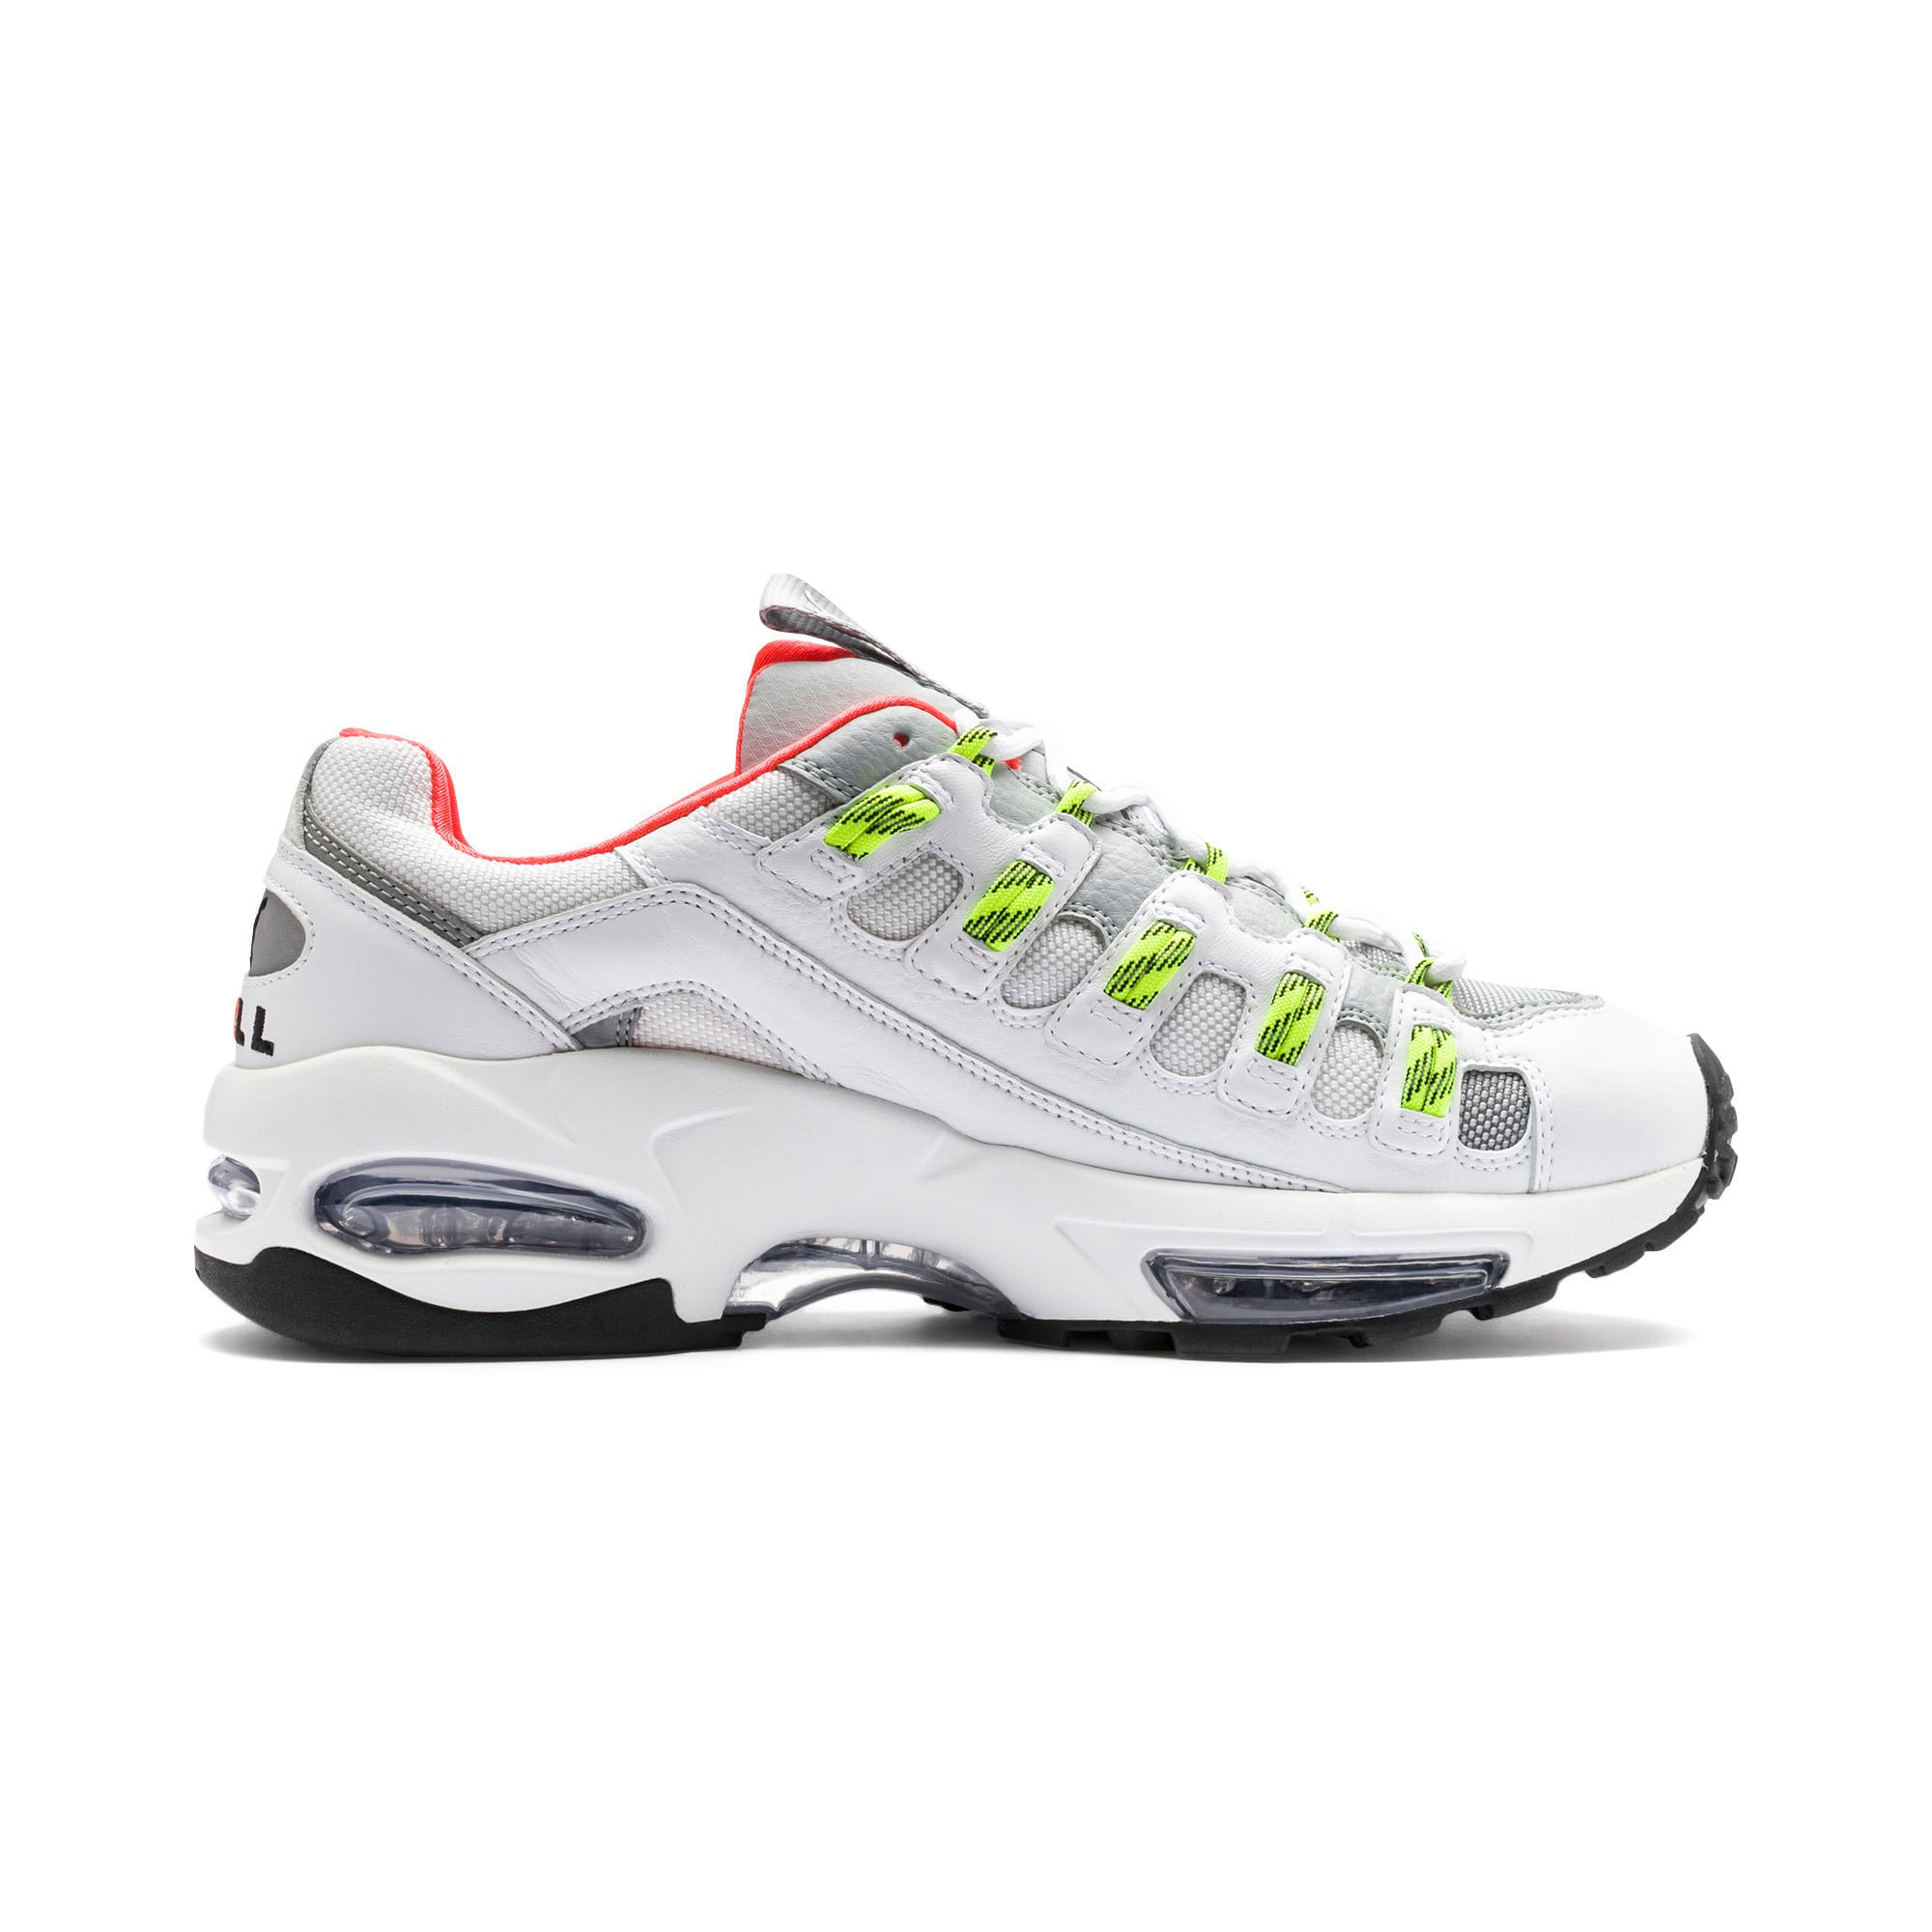 Thumbnail 6 of CELL Endura Rebound Sneakers, Puma White-High Rise, medium